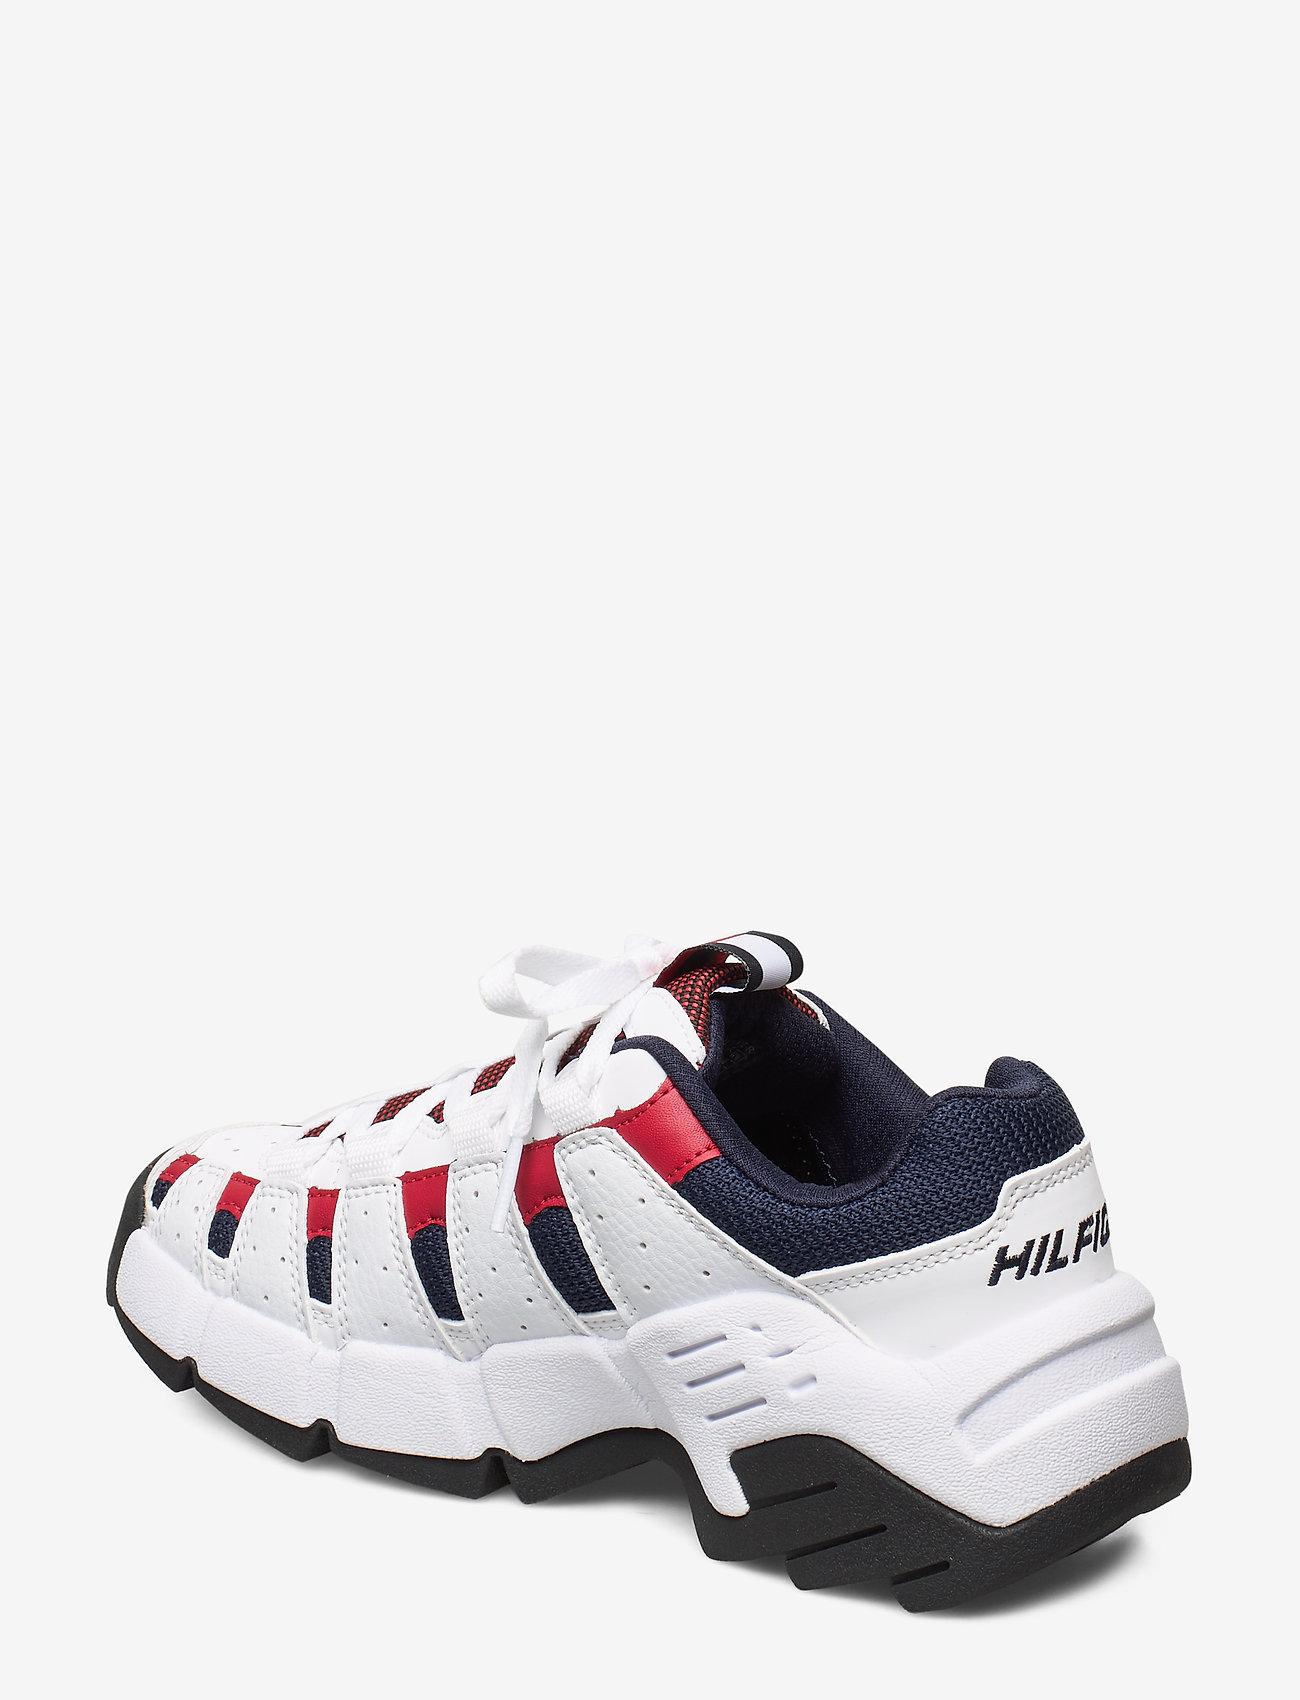 Wmns Chunky Heritage Sneaker (Rwb) - Tommy Hilfiger